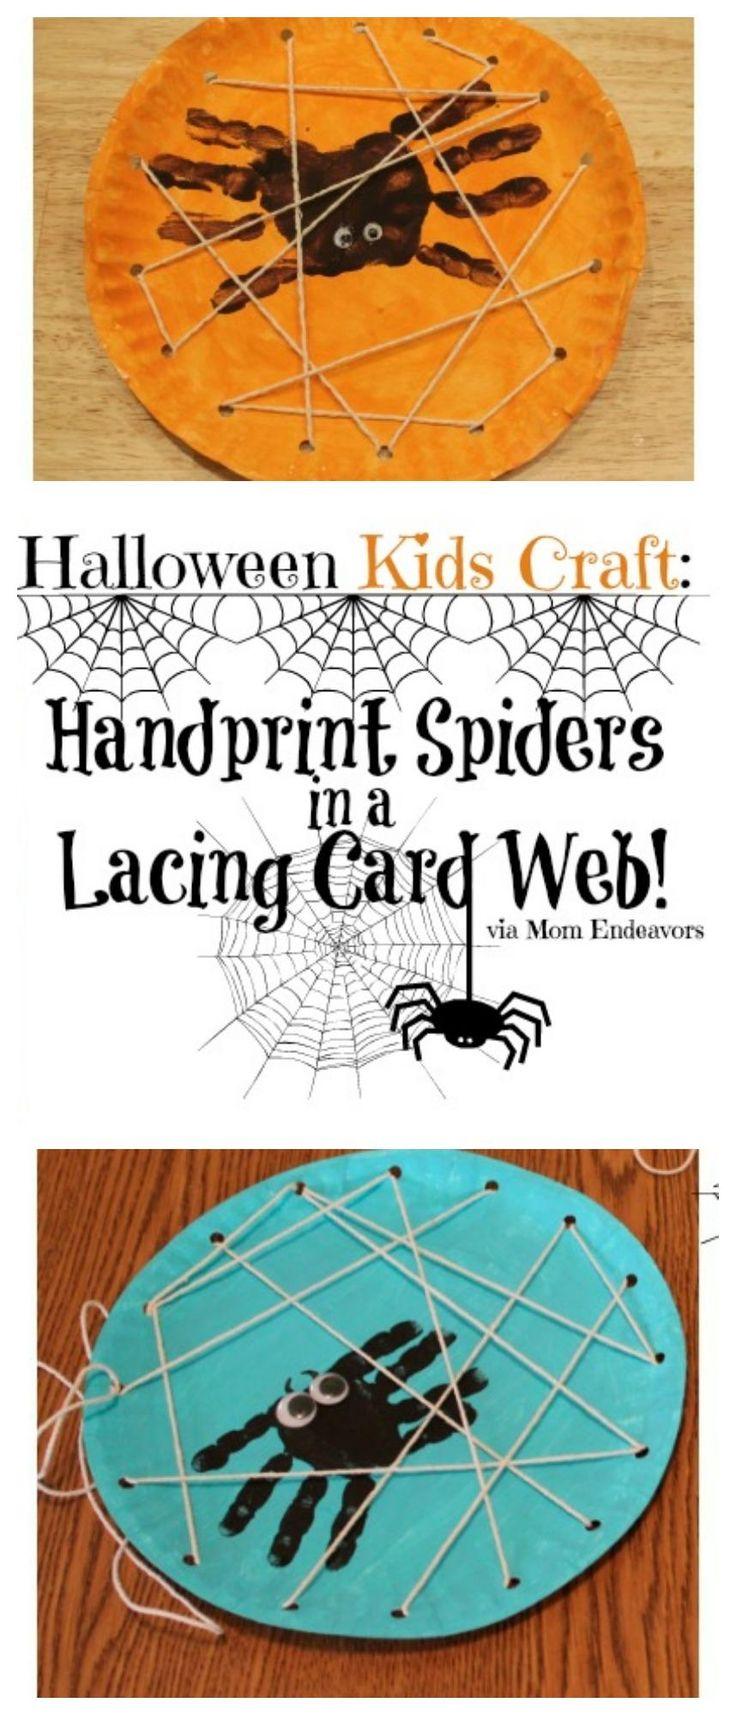 DIY Halloween: DIY Handprint Spiders in a DIY Lacing Card Web: DIY Halloween Decorations